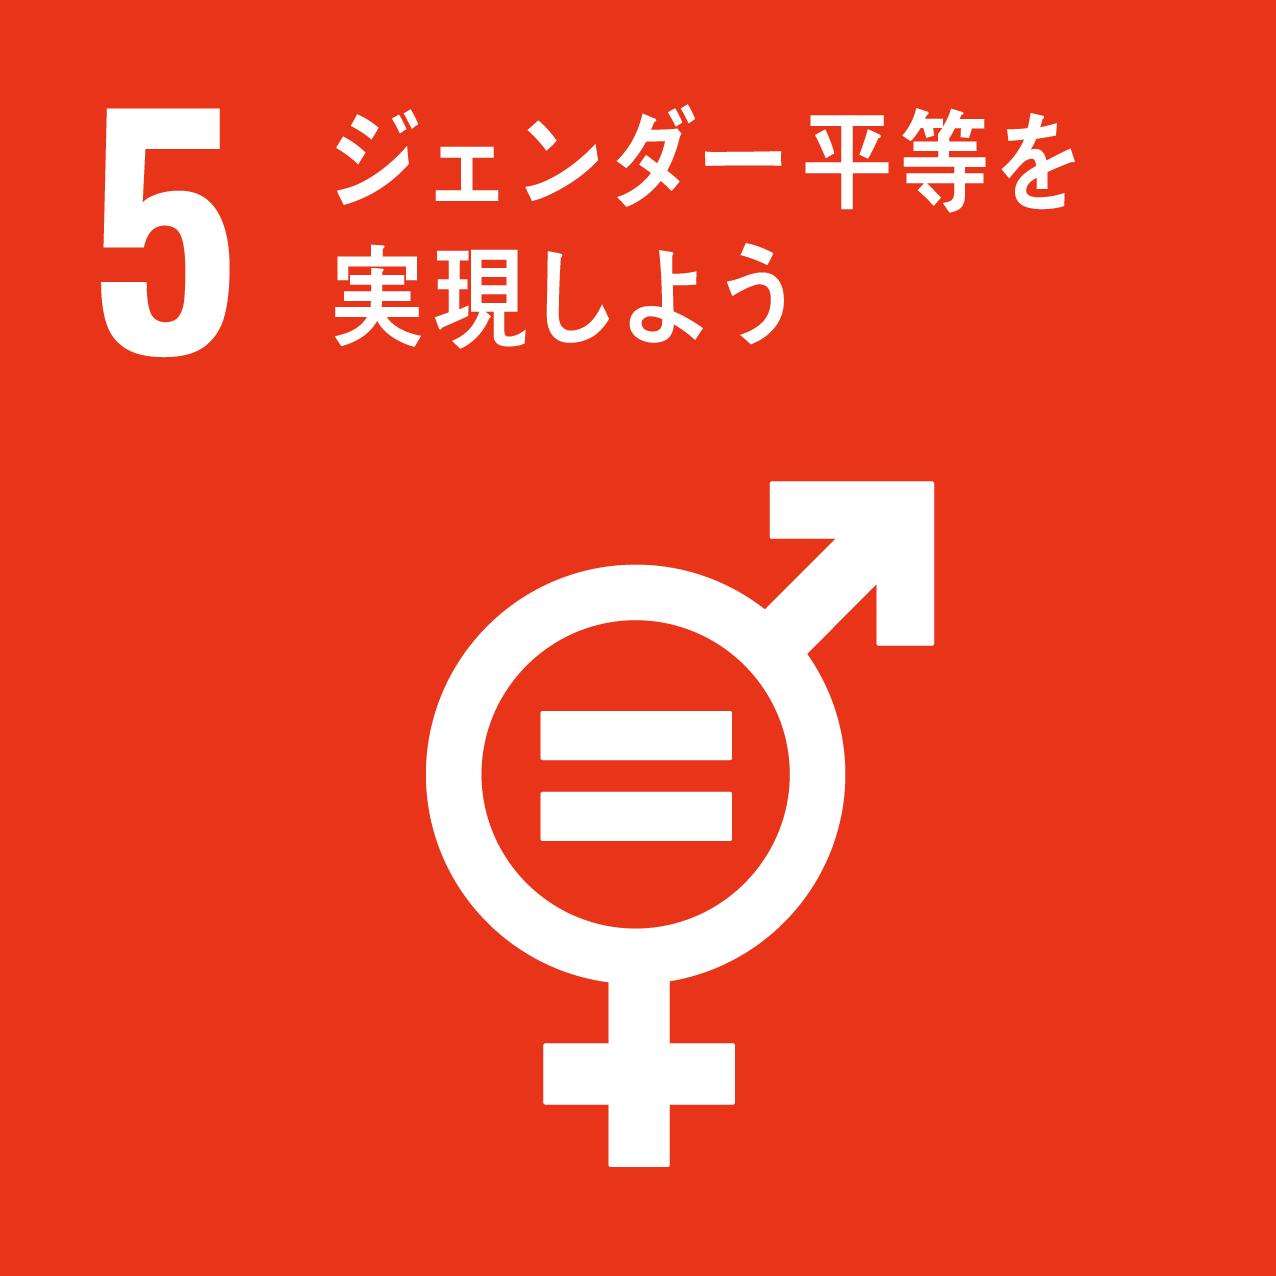 SDGs目標アイコン 5.ジェンダー平等を実現しよう